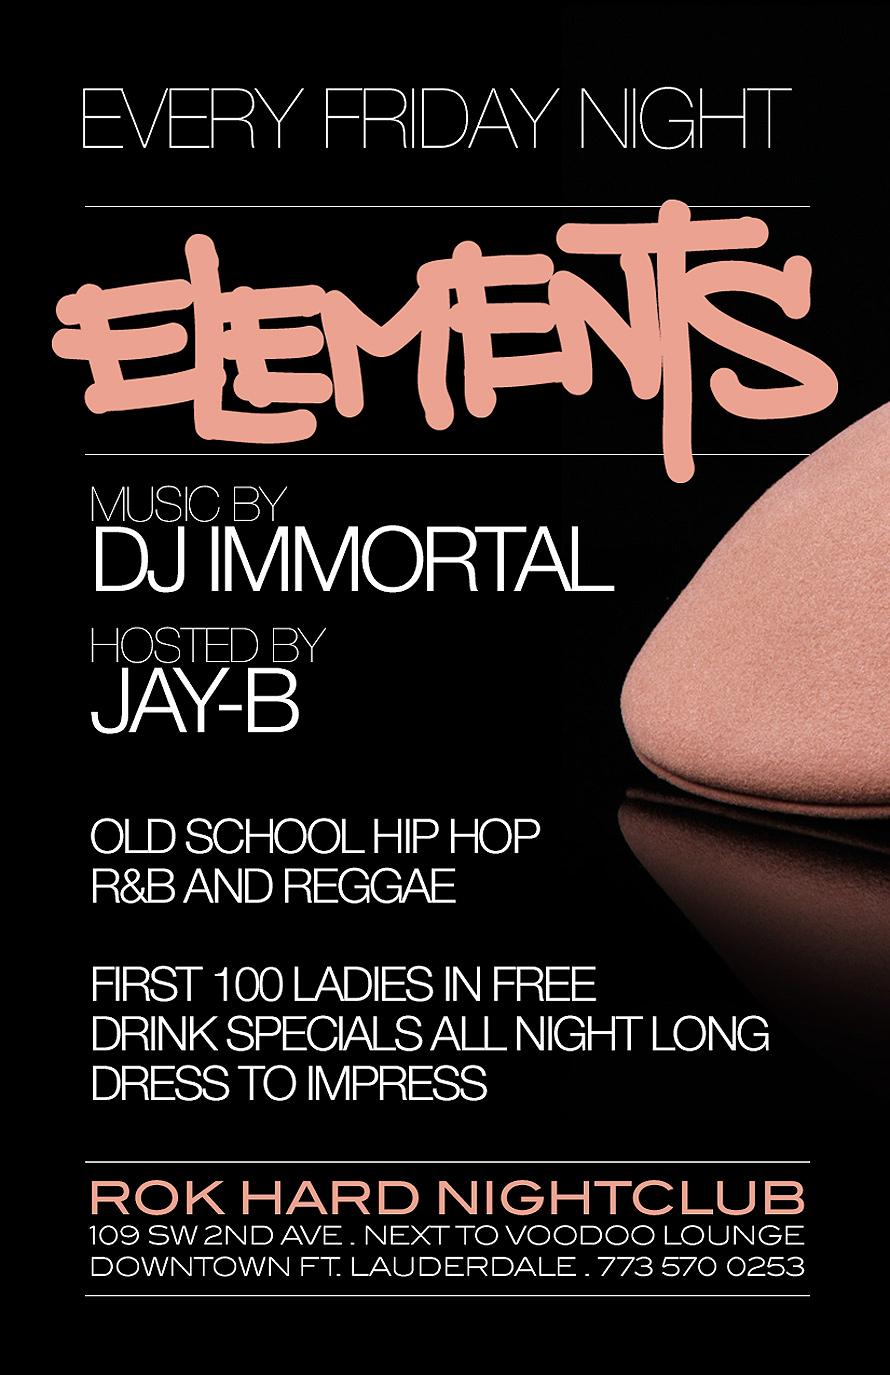 Every Friday Night Rok Hard Nightclub